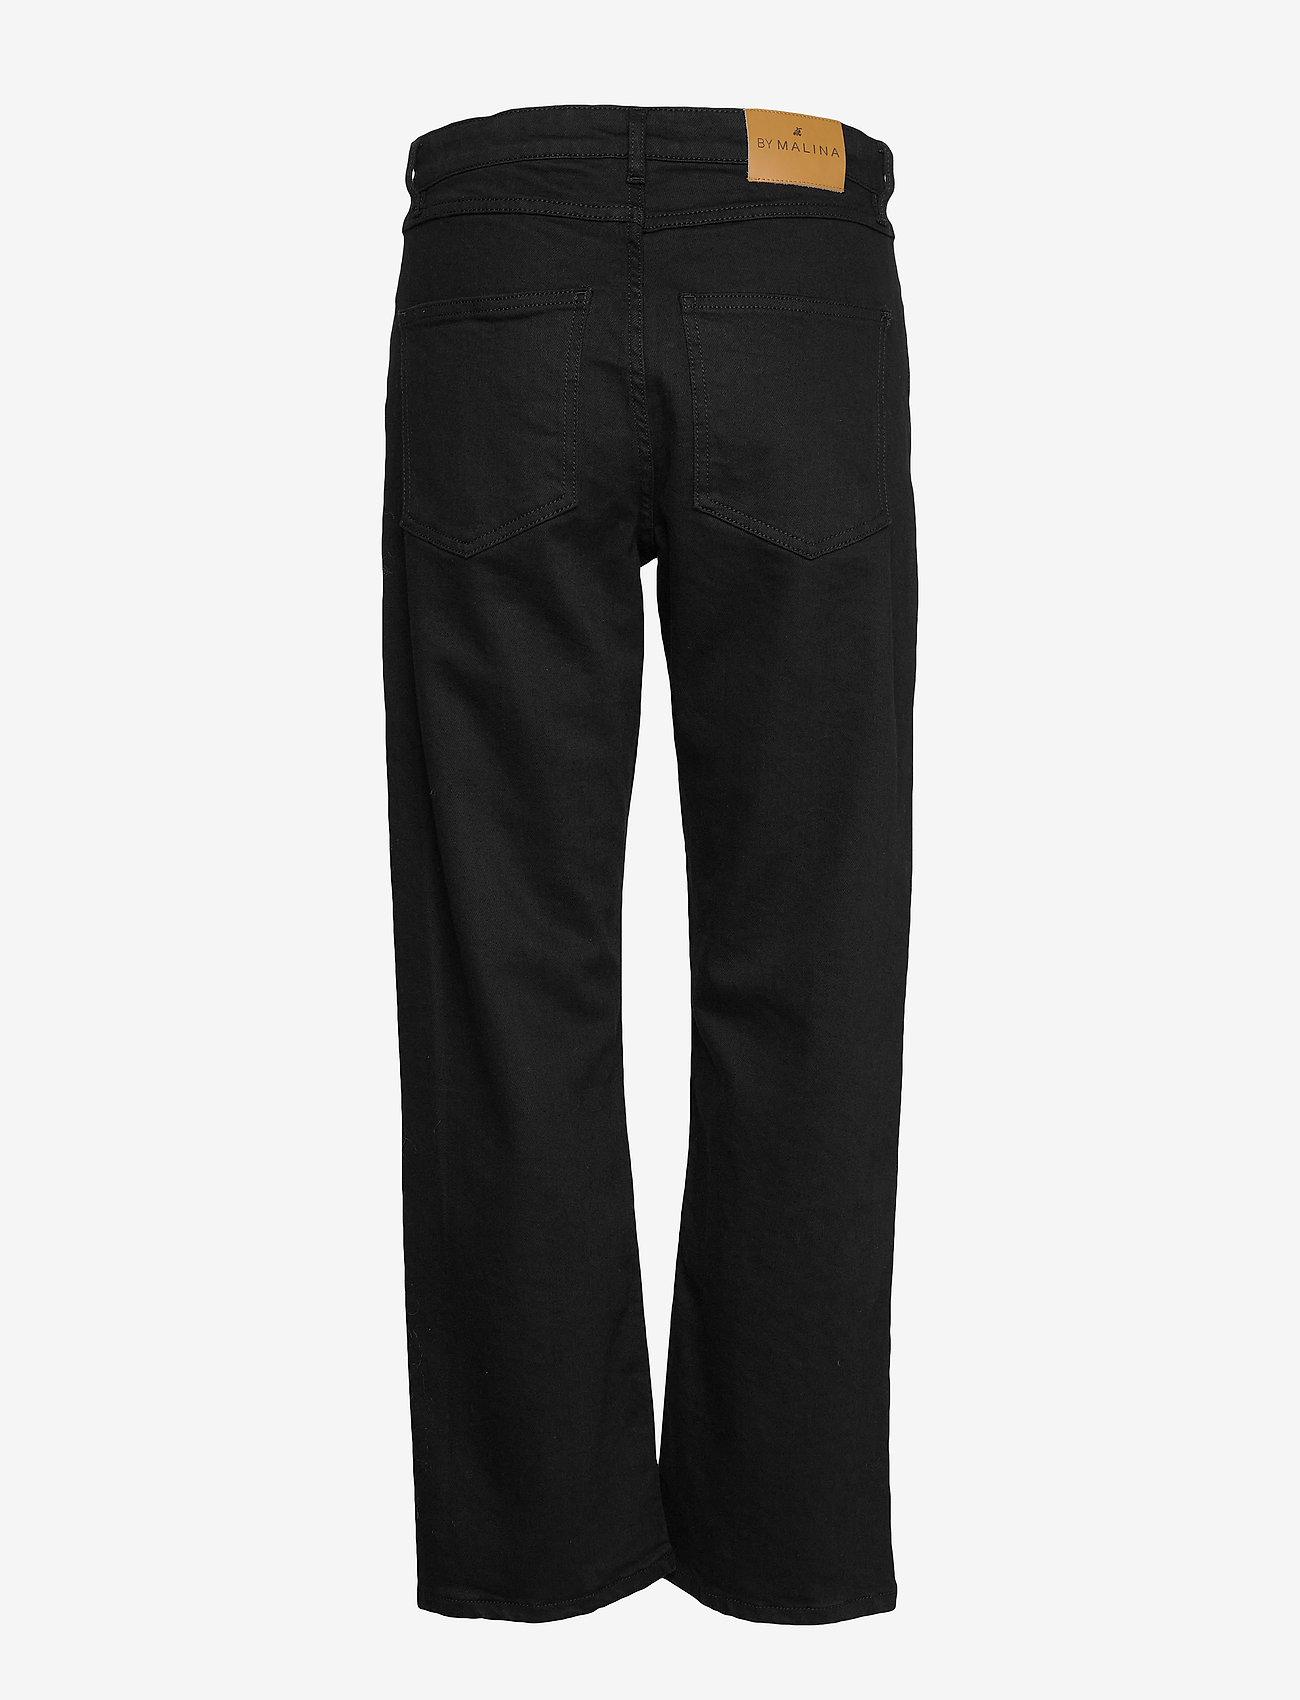 By Malina - Edith jeans - straight regular - black - 2